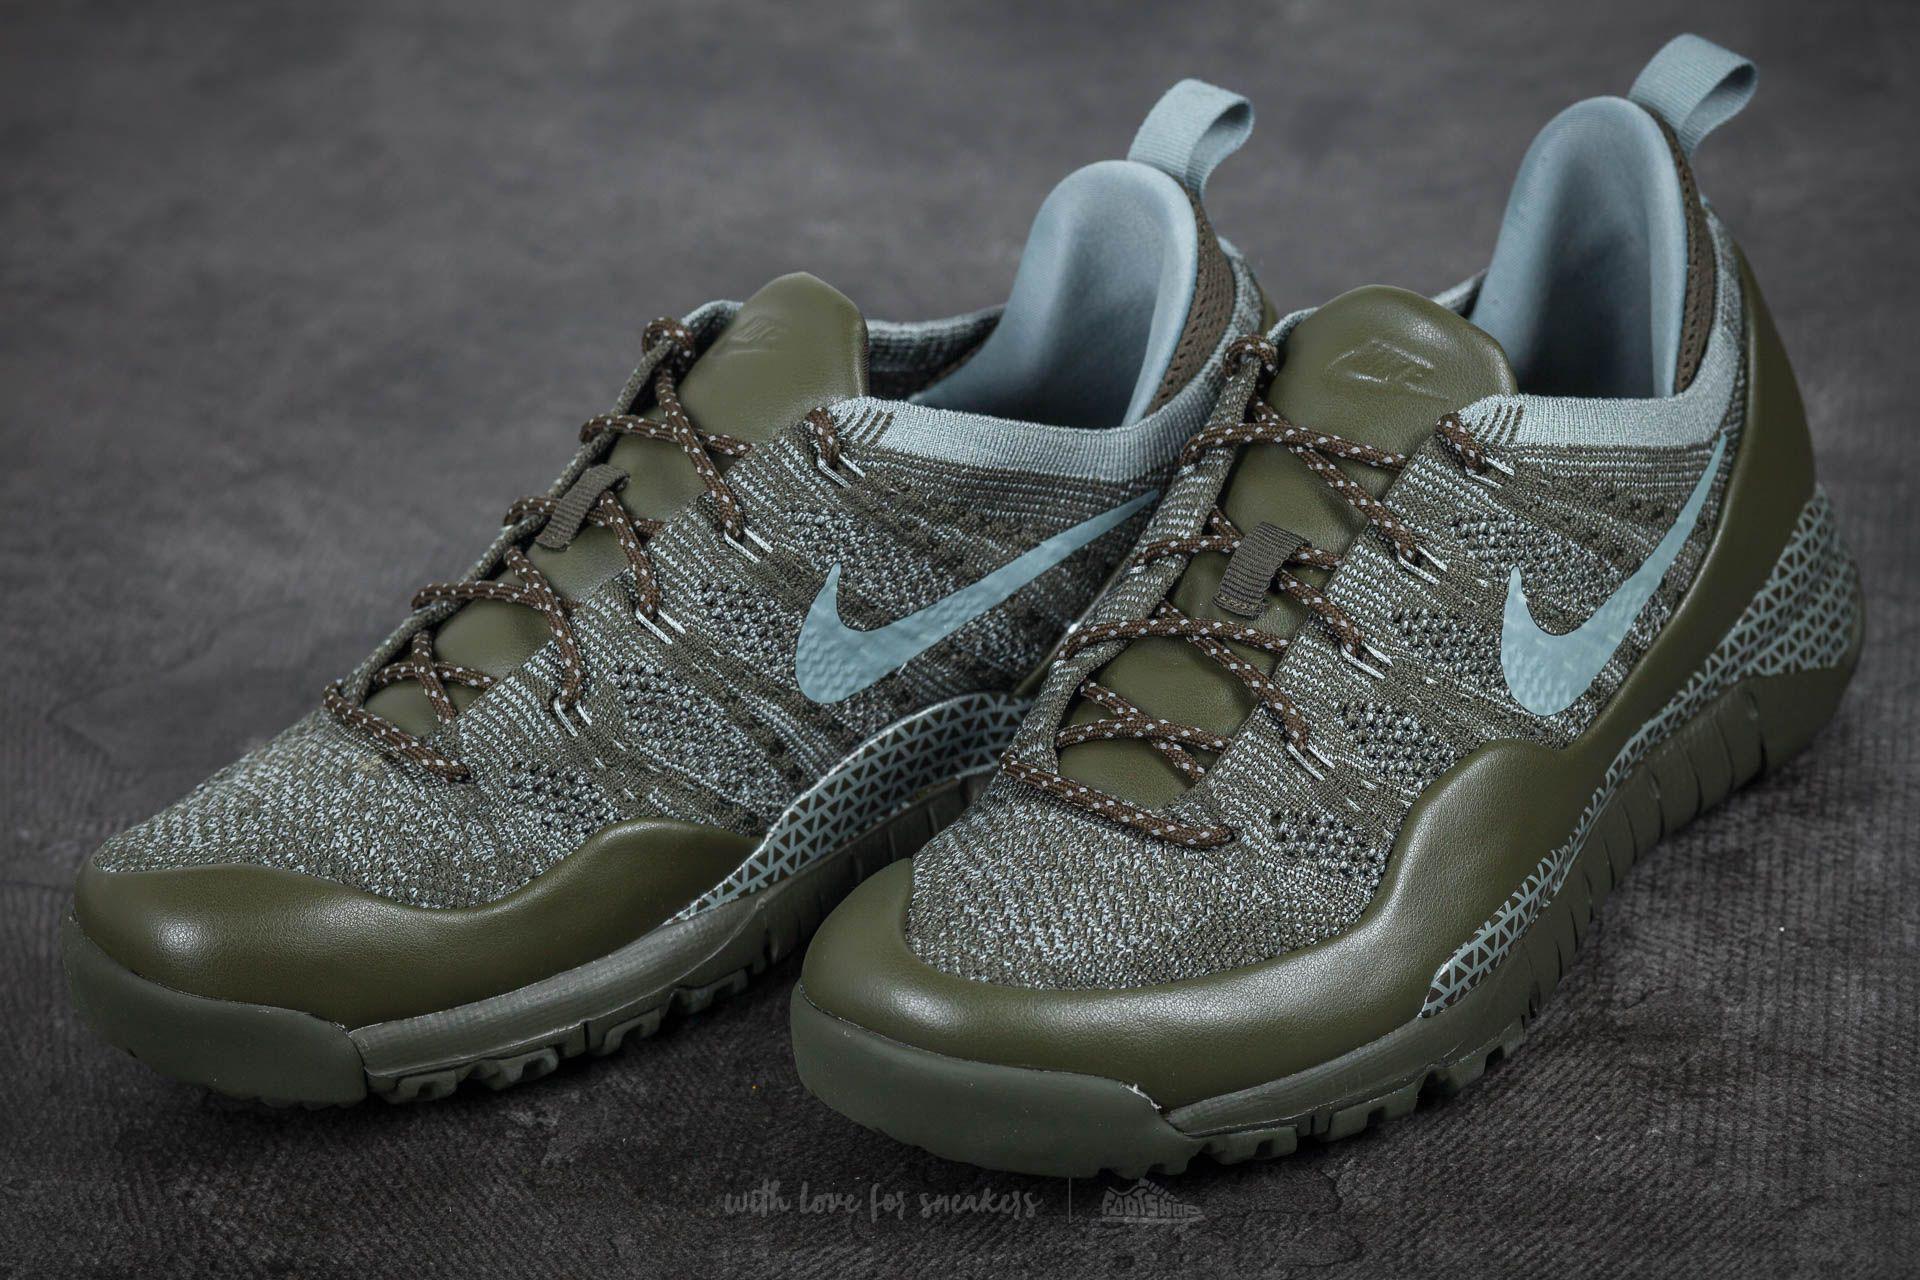 f8f2fbcb14ad ... Lyst - Nike Lupinek Flyknit Low Cargo Khaki Mica Green in Green for Men  ...